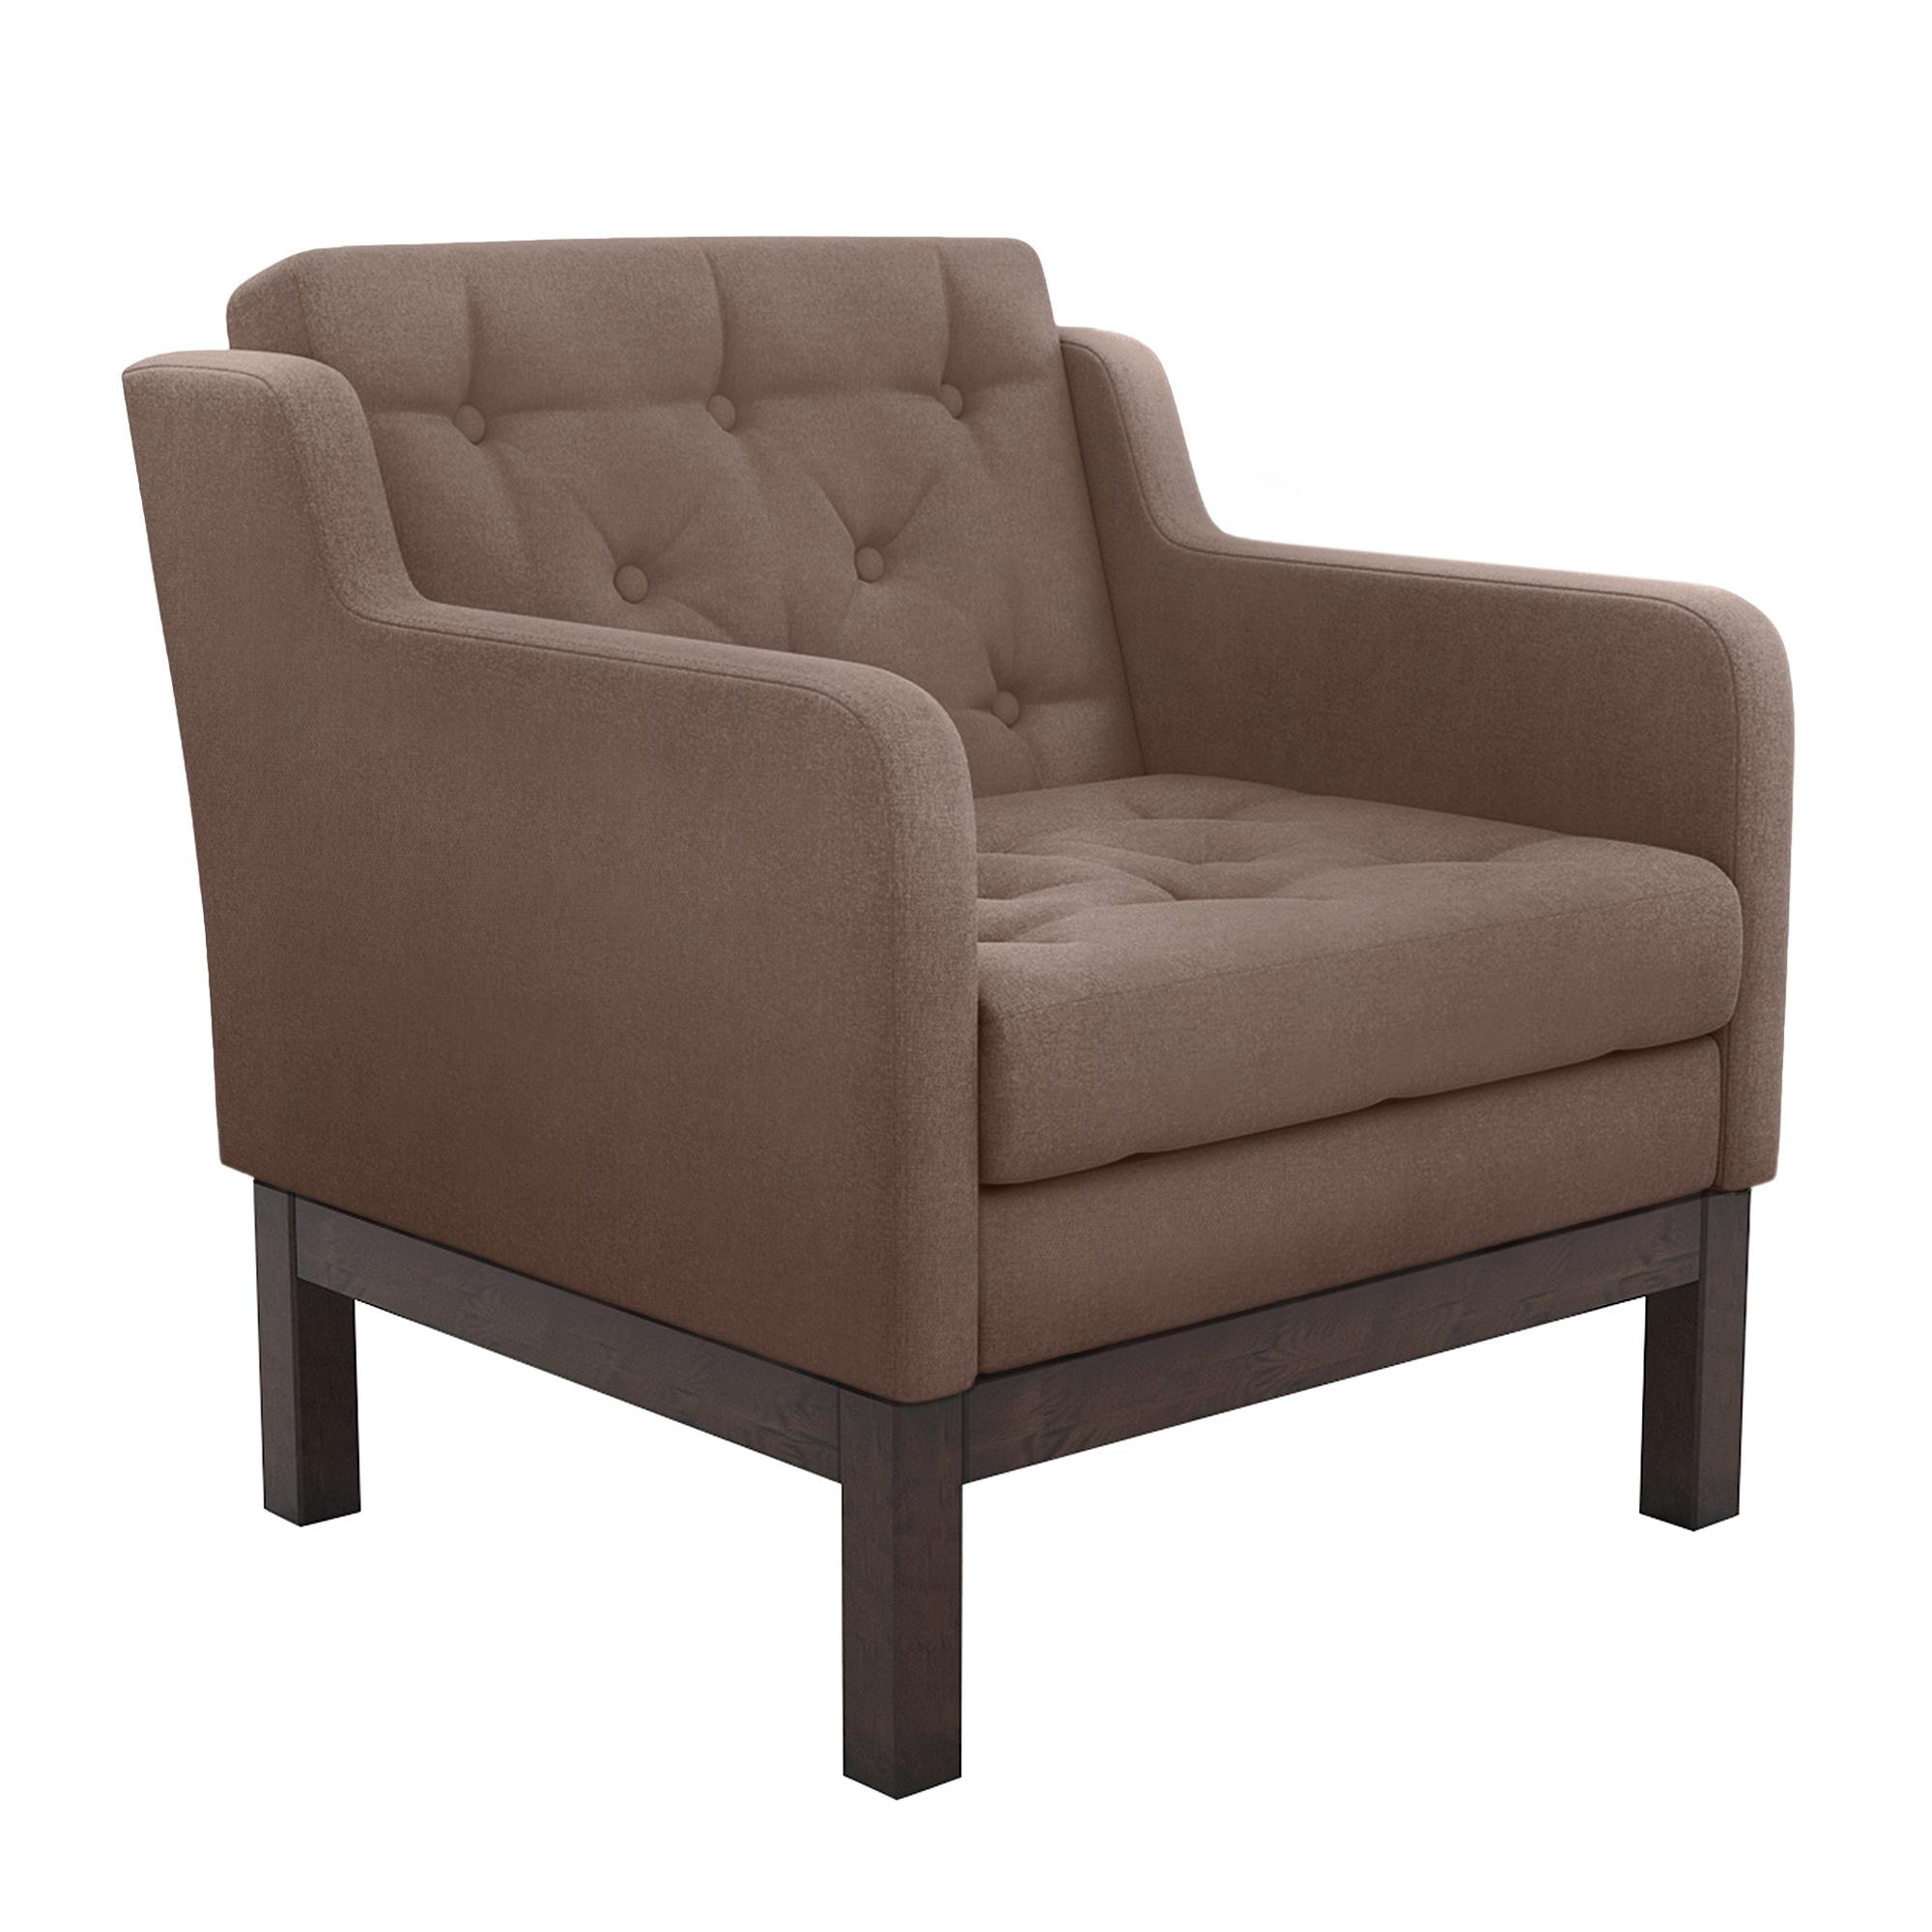 Фото - Кресло AS Алана 75.5x82x83 венге/чоколейт диван as алана б 193x82x83 венге чоколейт